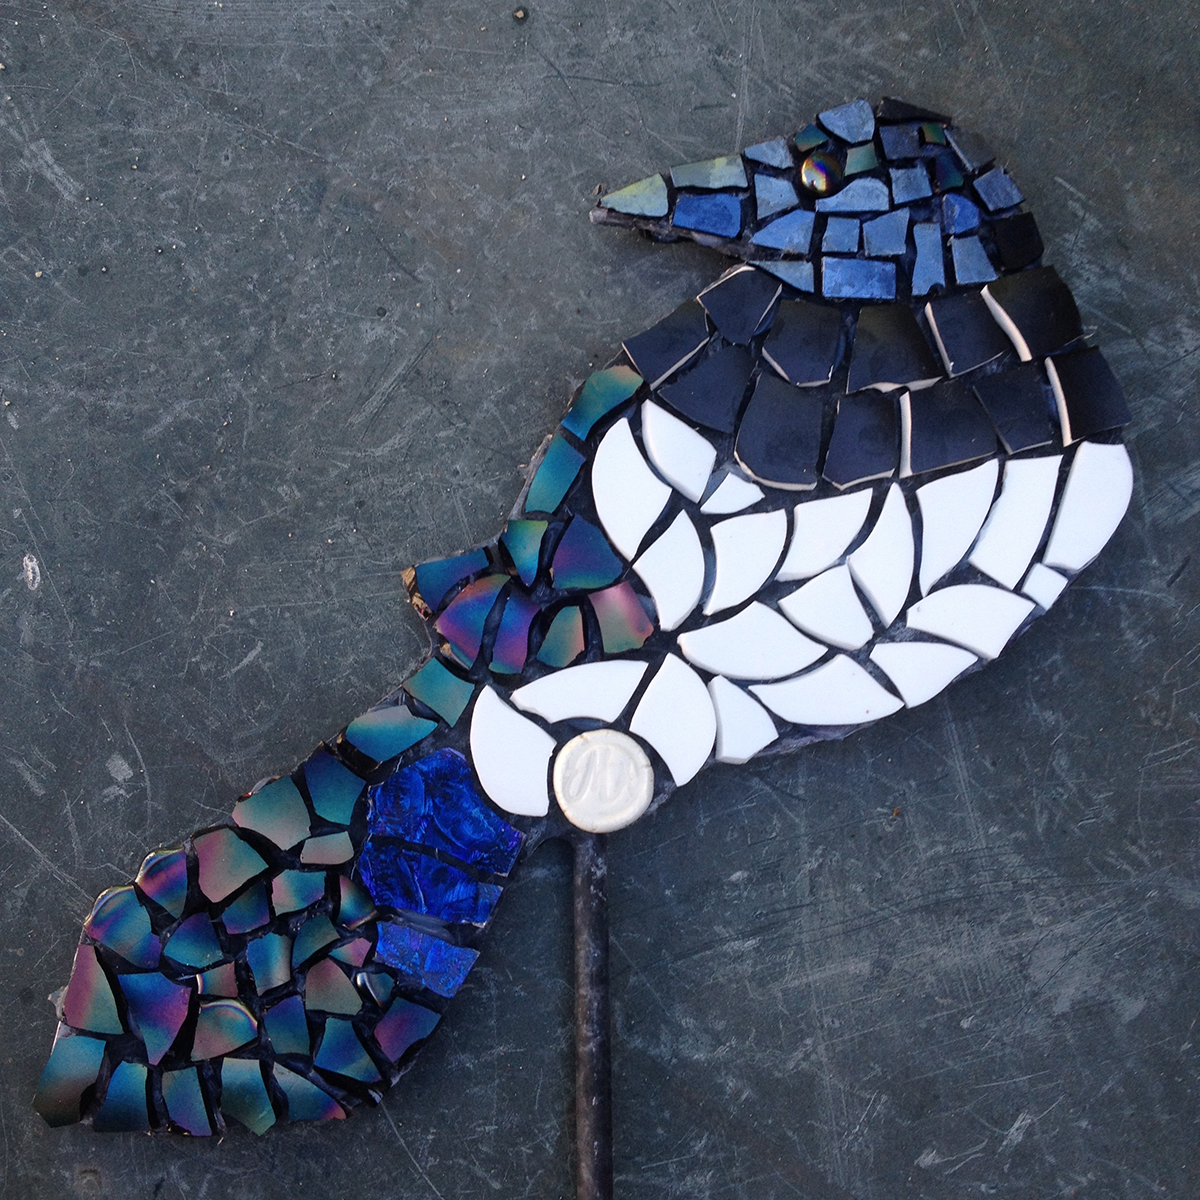 mosaic,magpie,art,sculpture,garden,vintage,retro,ceramic